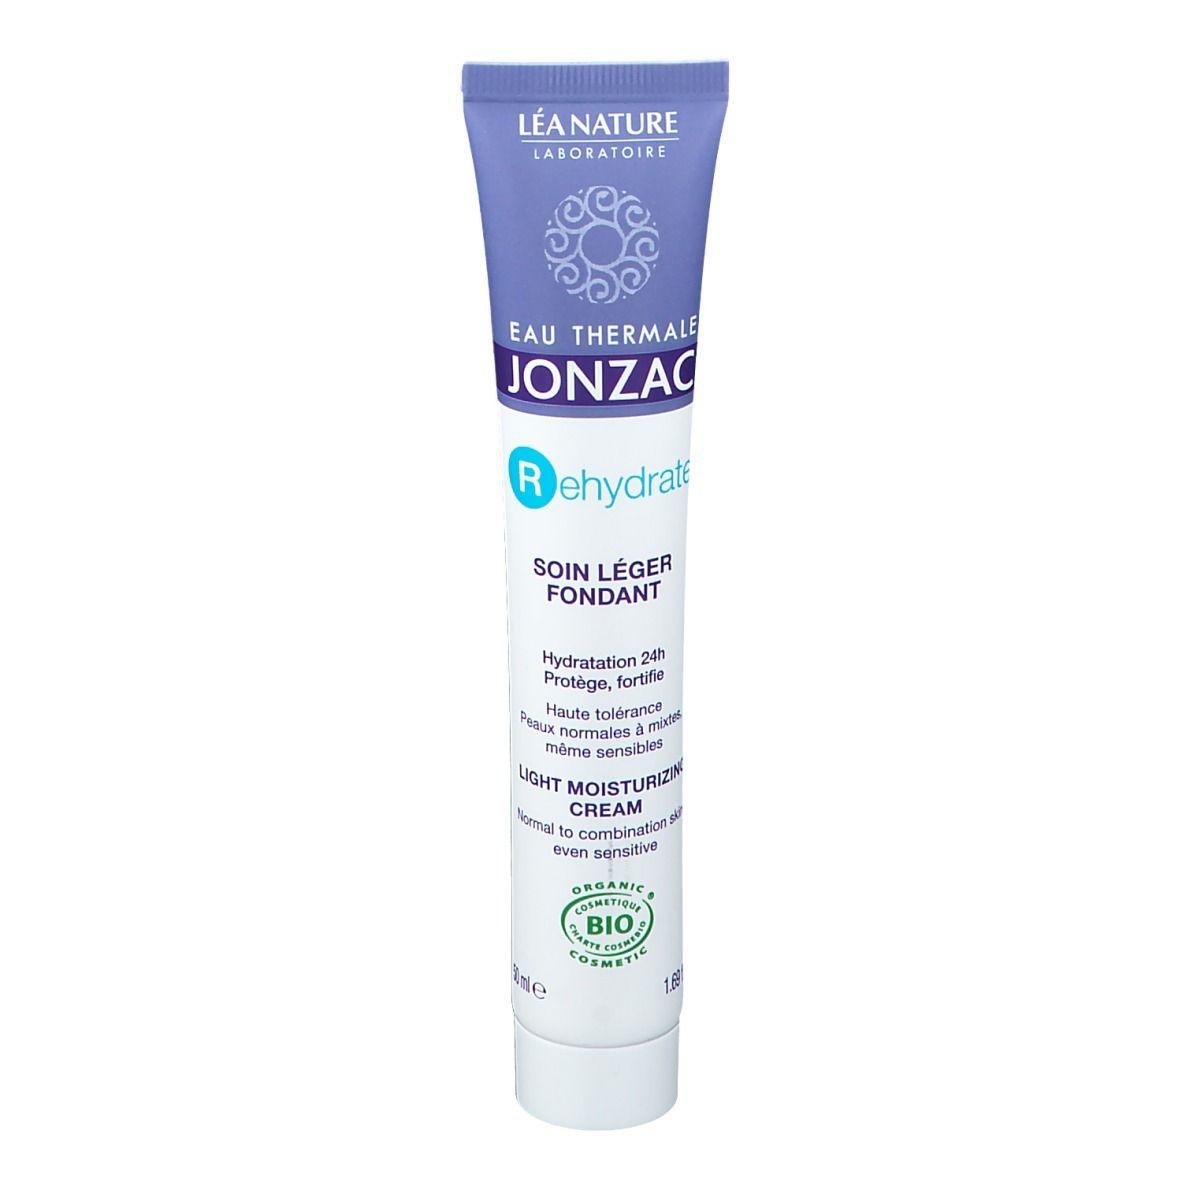 Eau Thermale Jonzac® Eau Thermale Jonzac REhydrate soin léger réhydratant ml crème